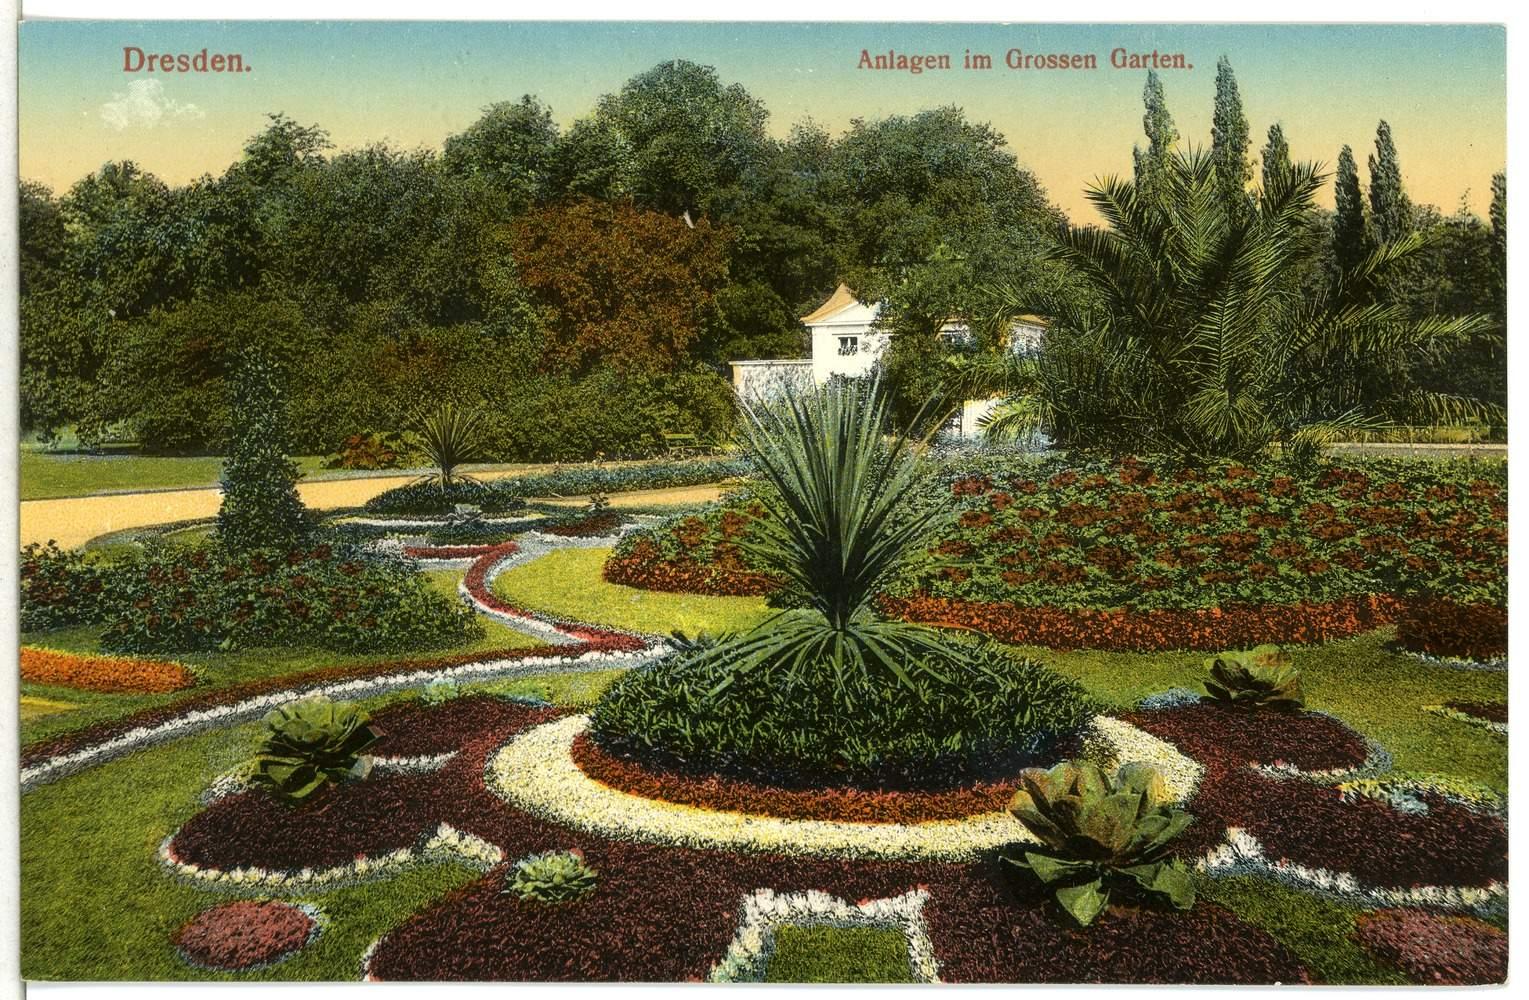 Dresden 1911 Anlagen im Großen Garten Brück & Sohn Kunstverlag